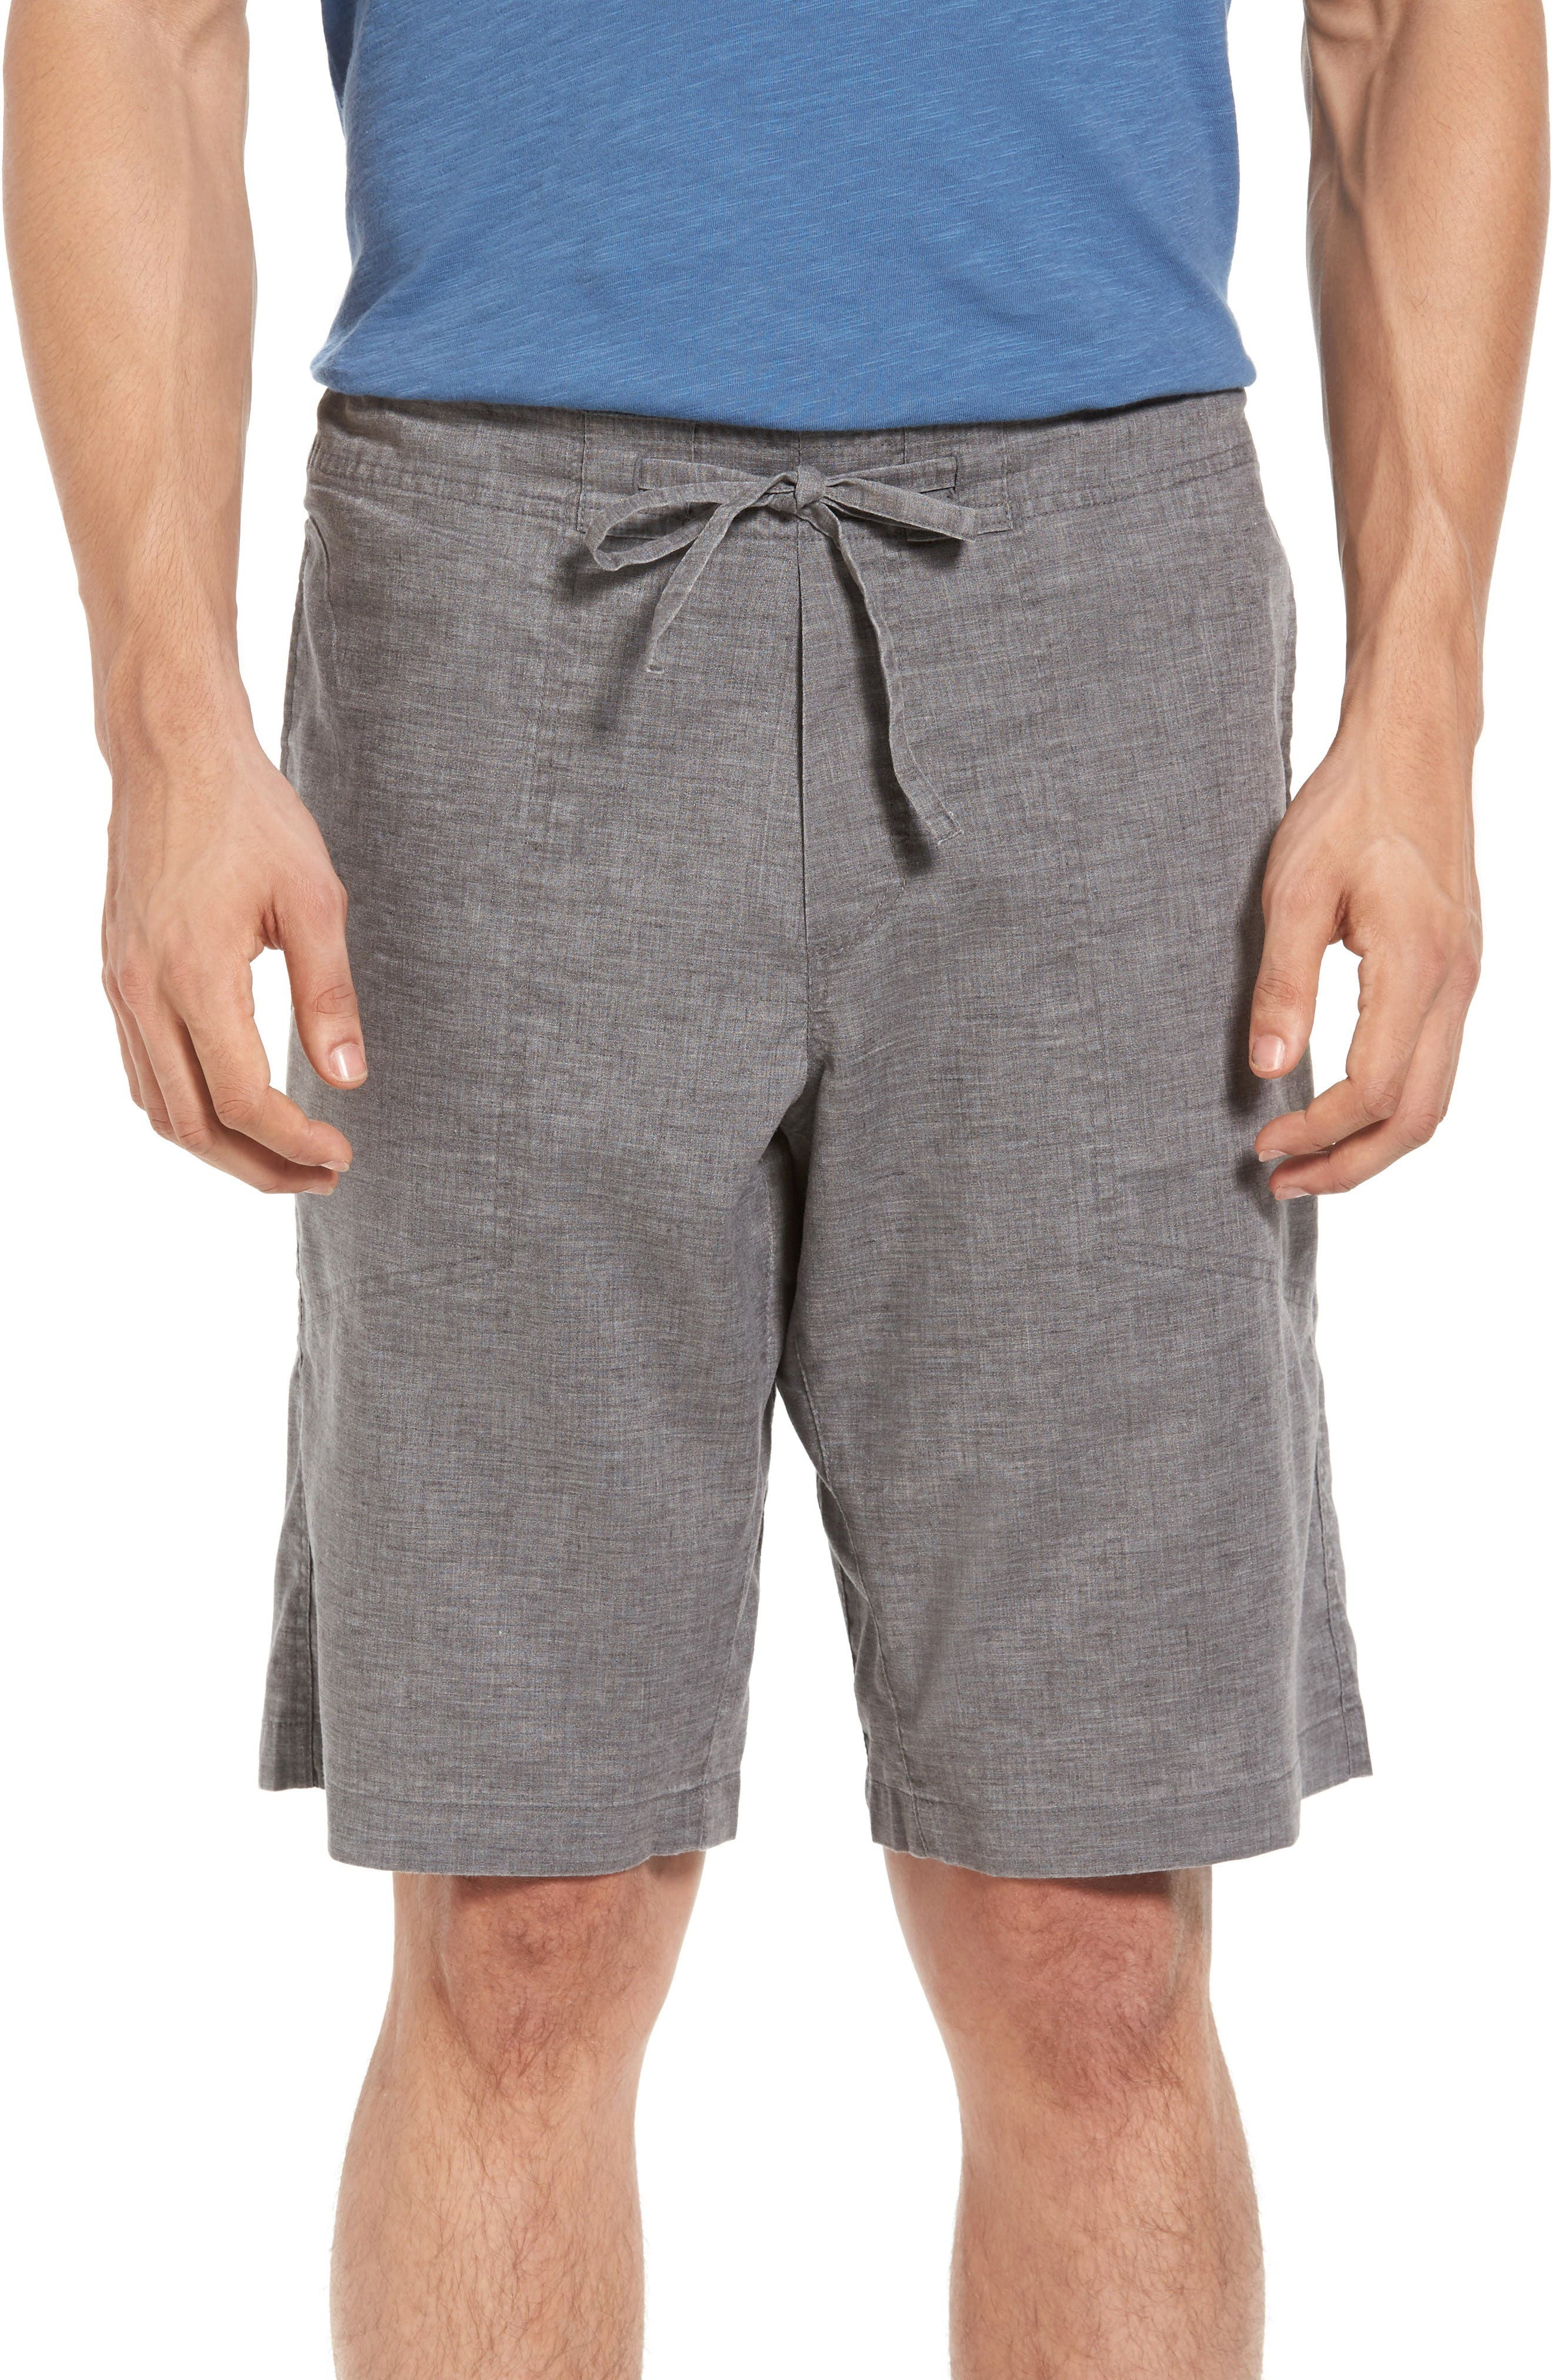 prAna 'Sutra' Training Shorts